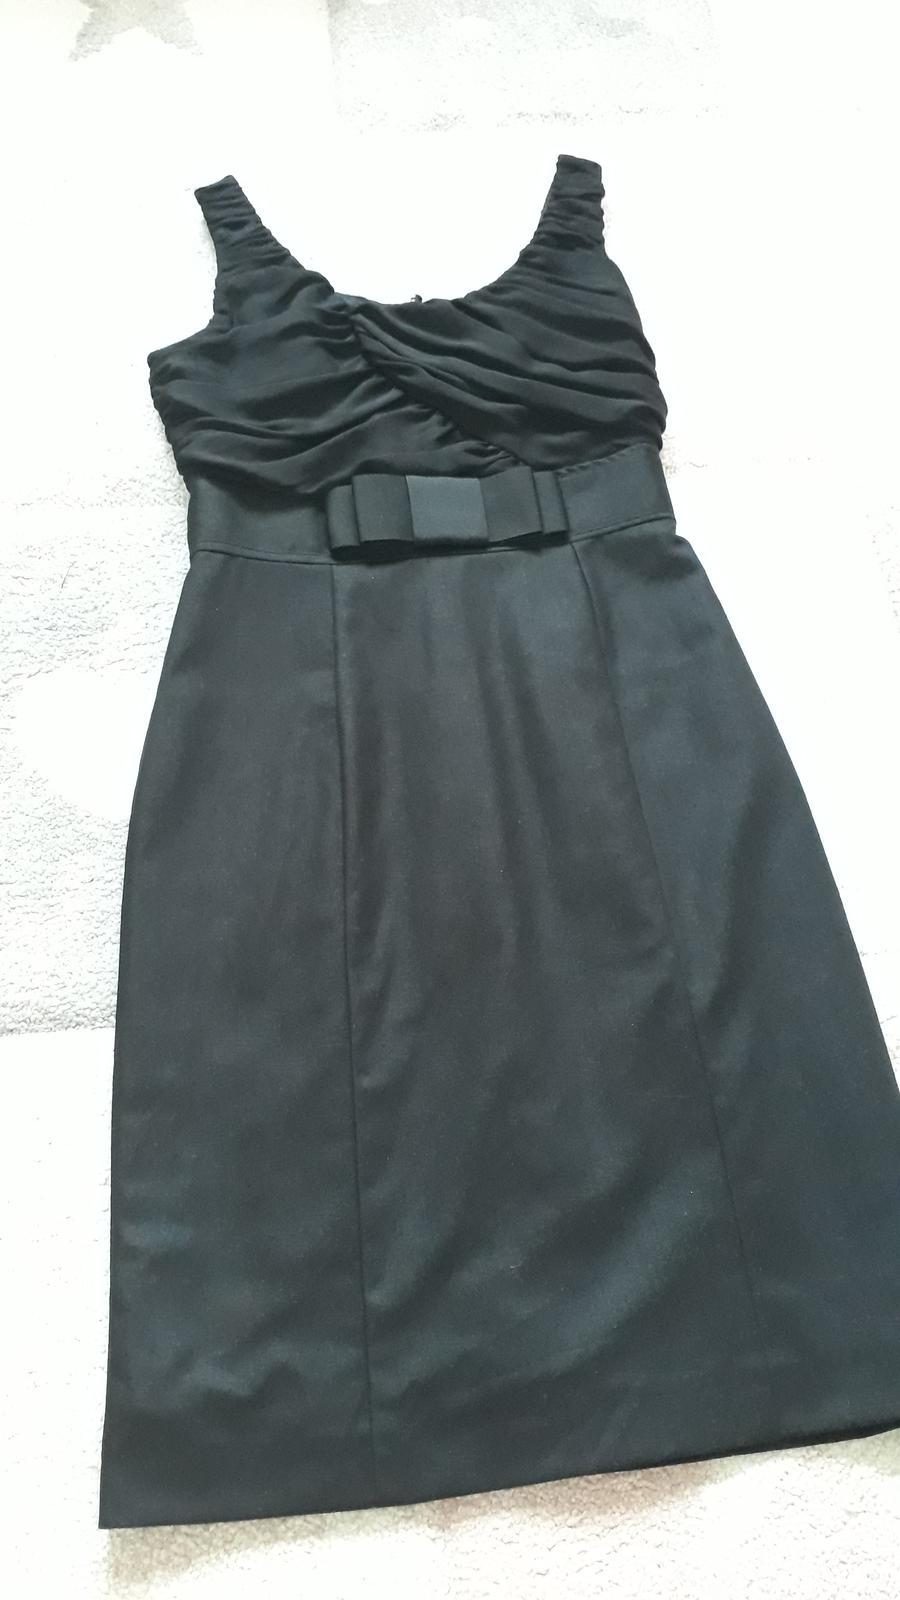 Púzdrové šaty - Obrázok č. 3